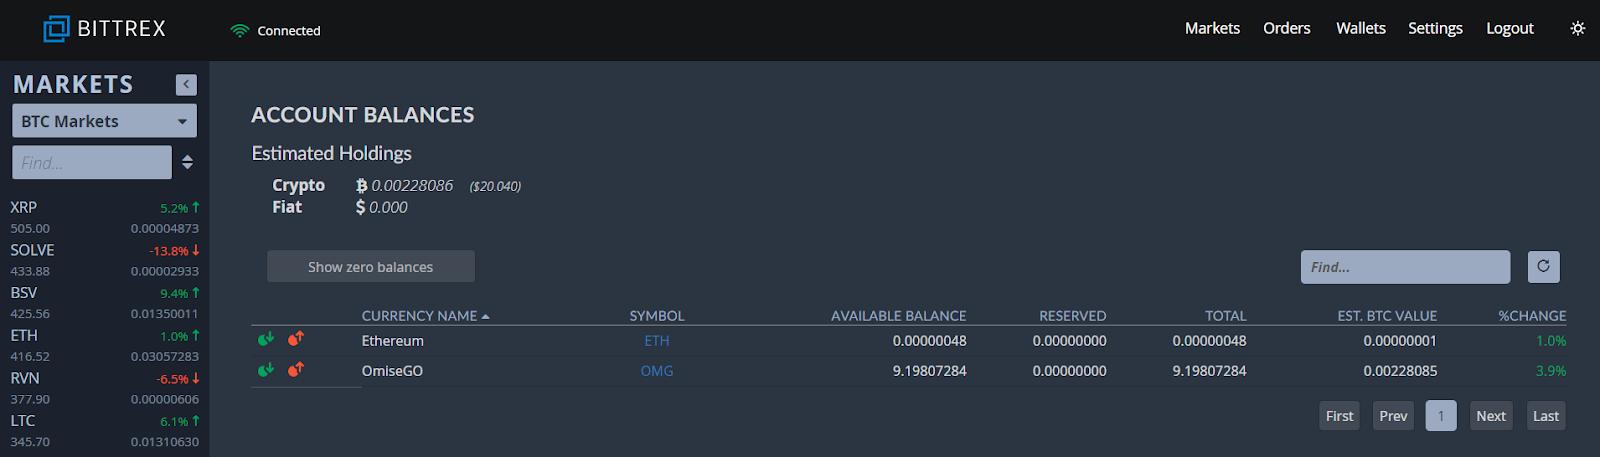 Bittrex Account balances screen shot.